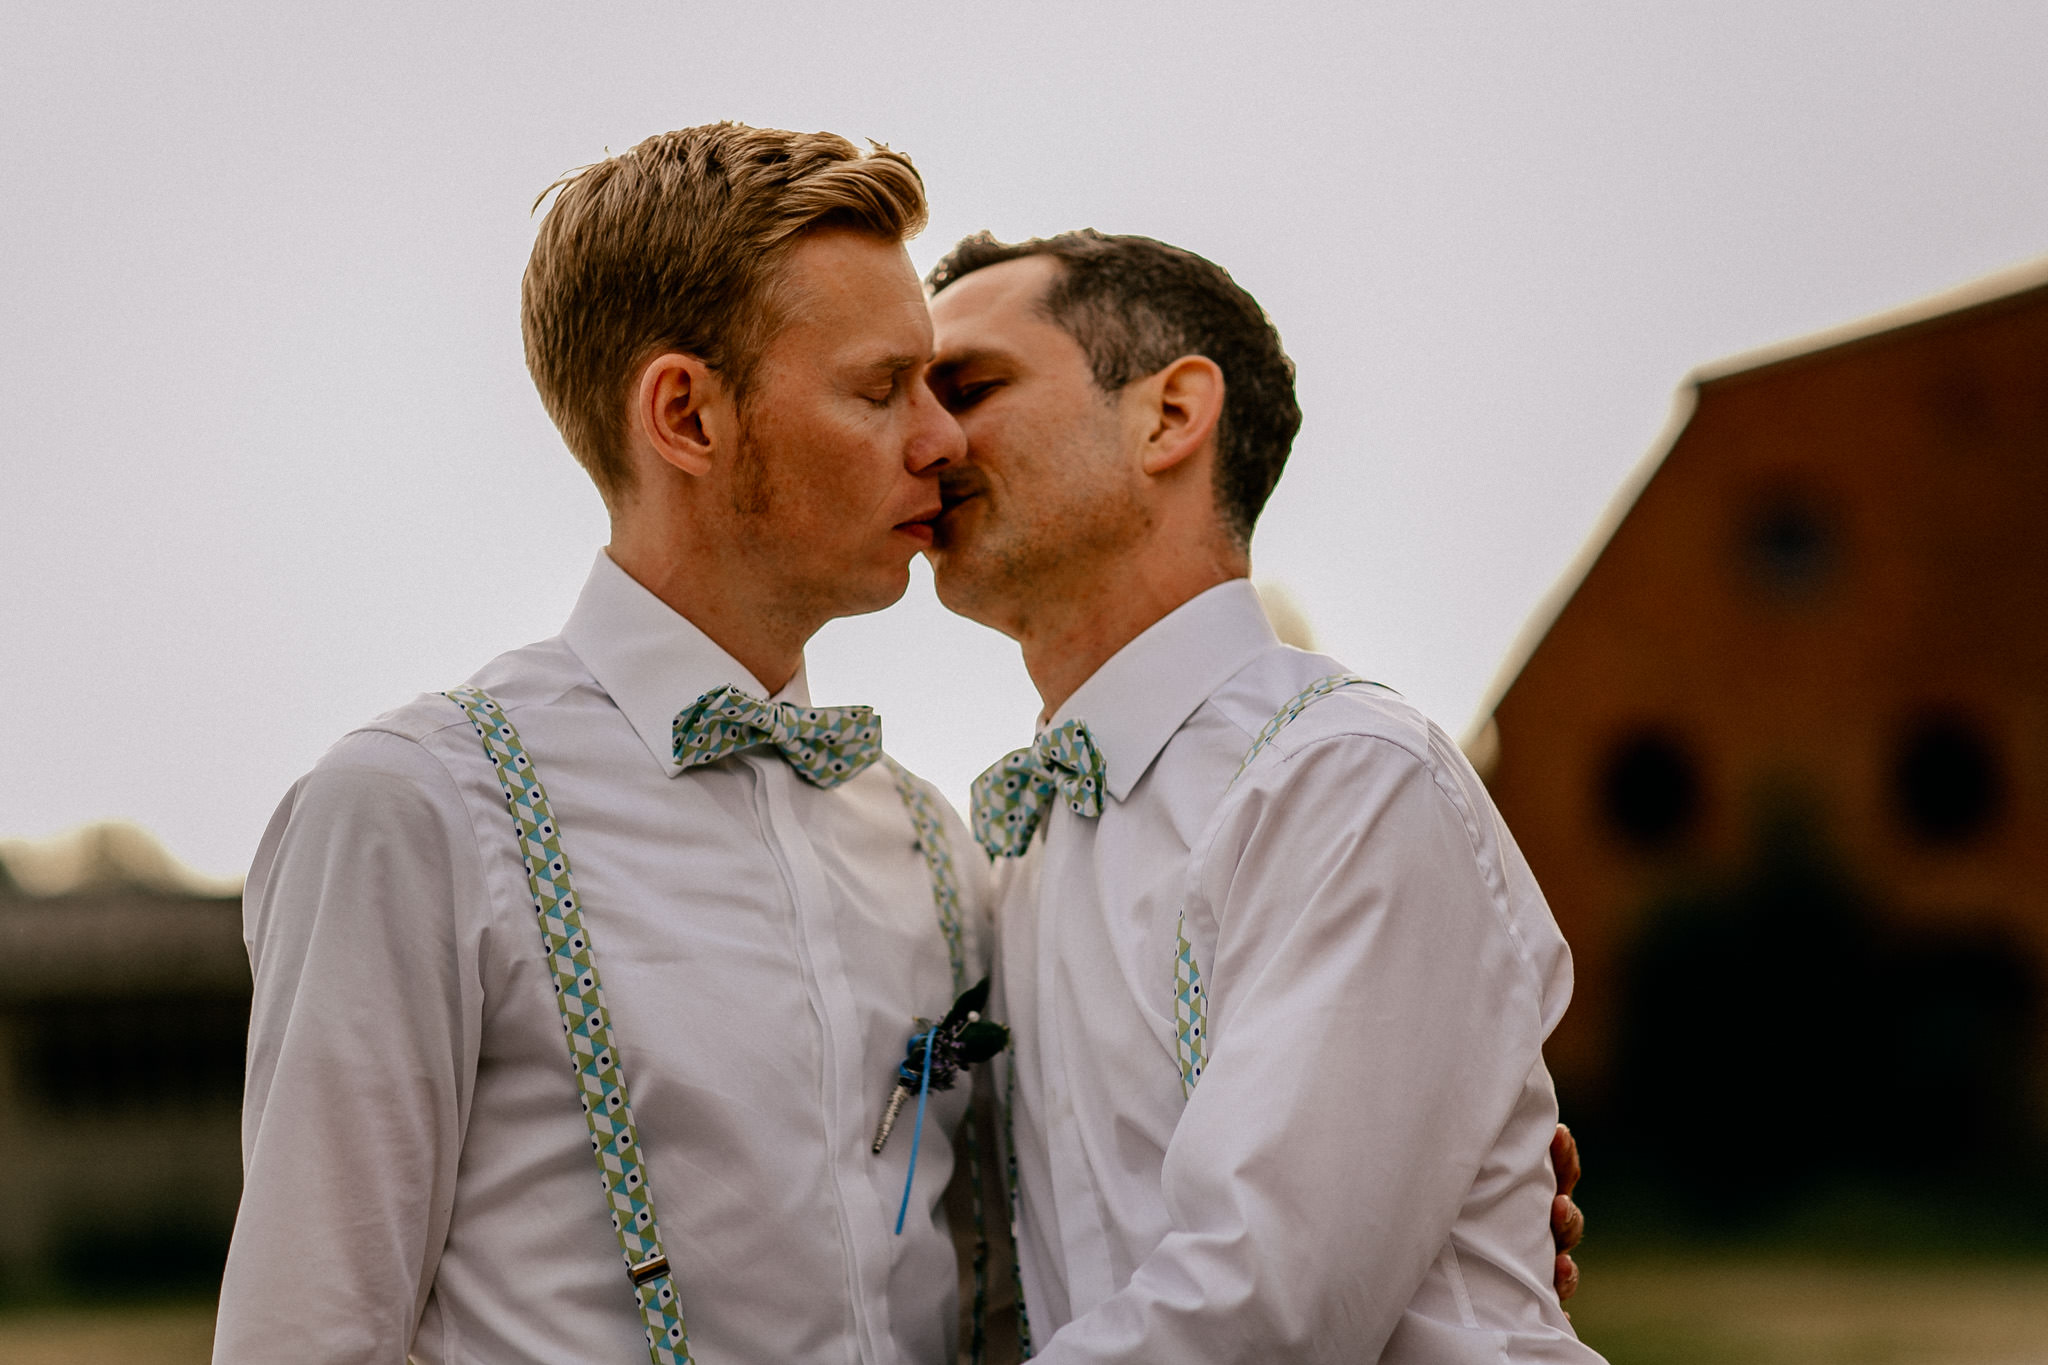 Gay dating germany